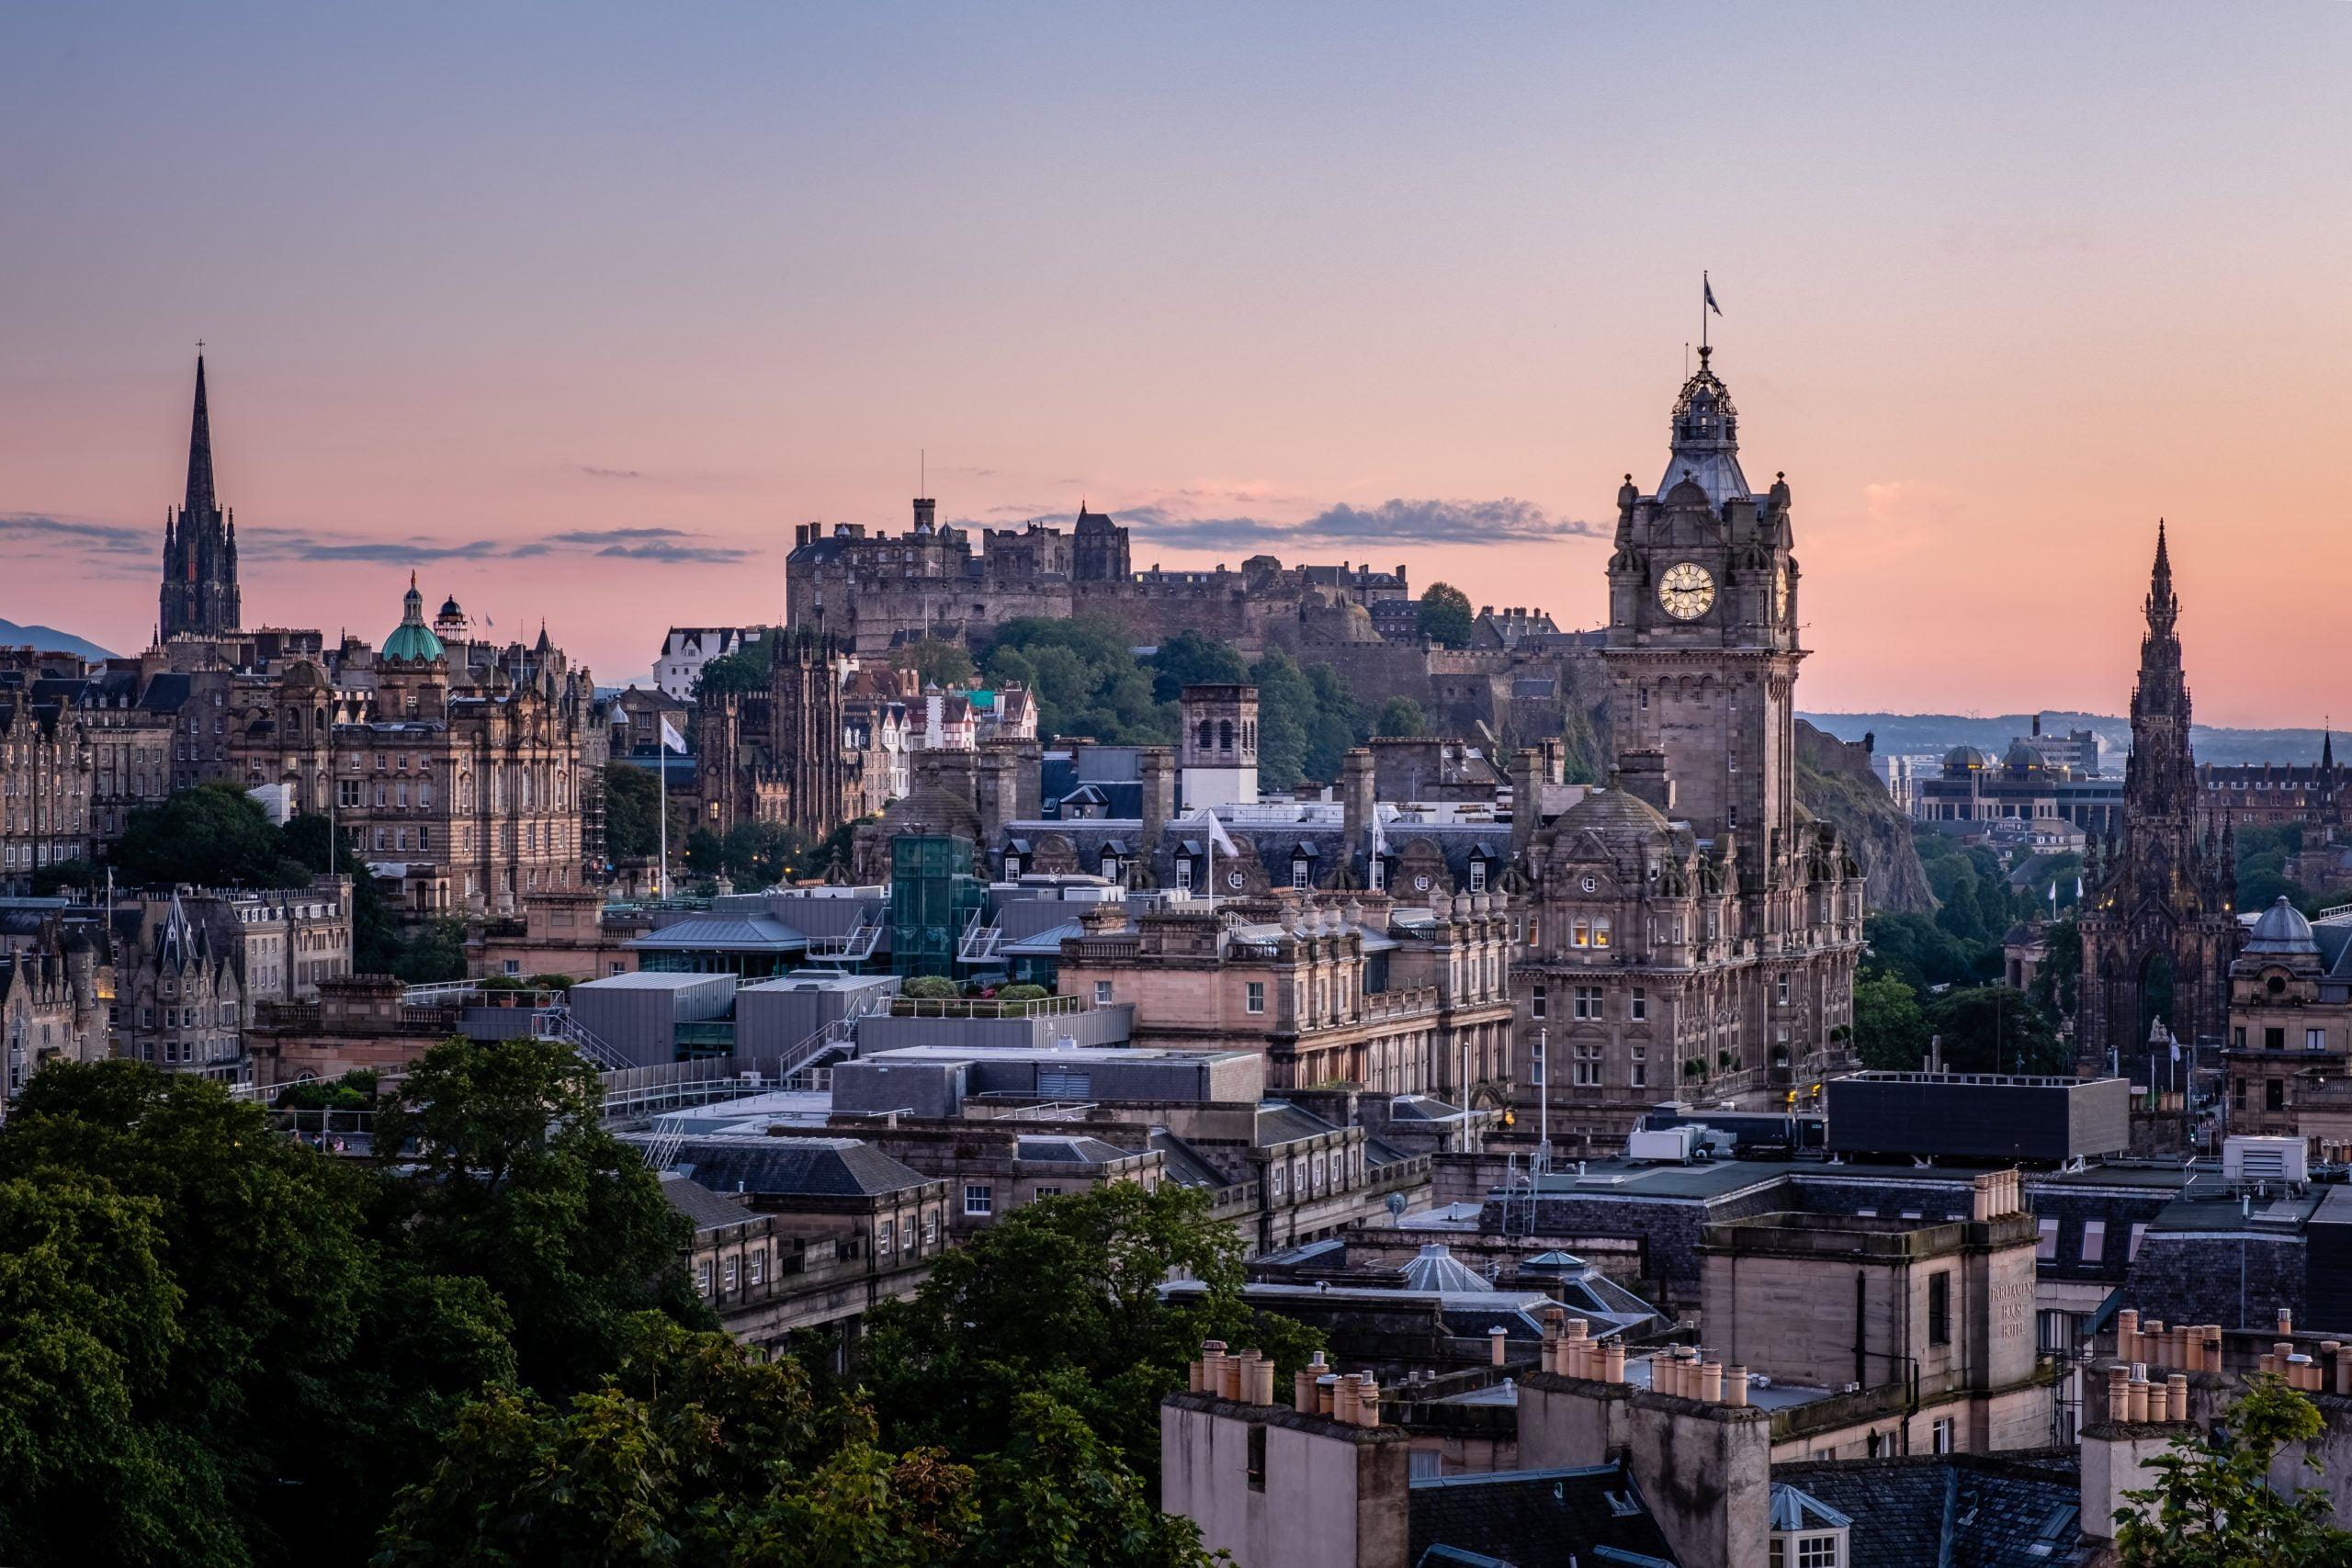 Cosa vedere ad Edimburgo in un weekend